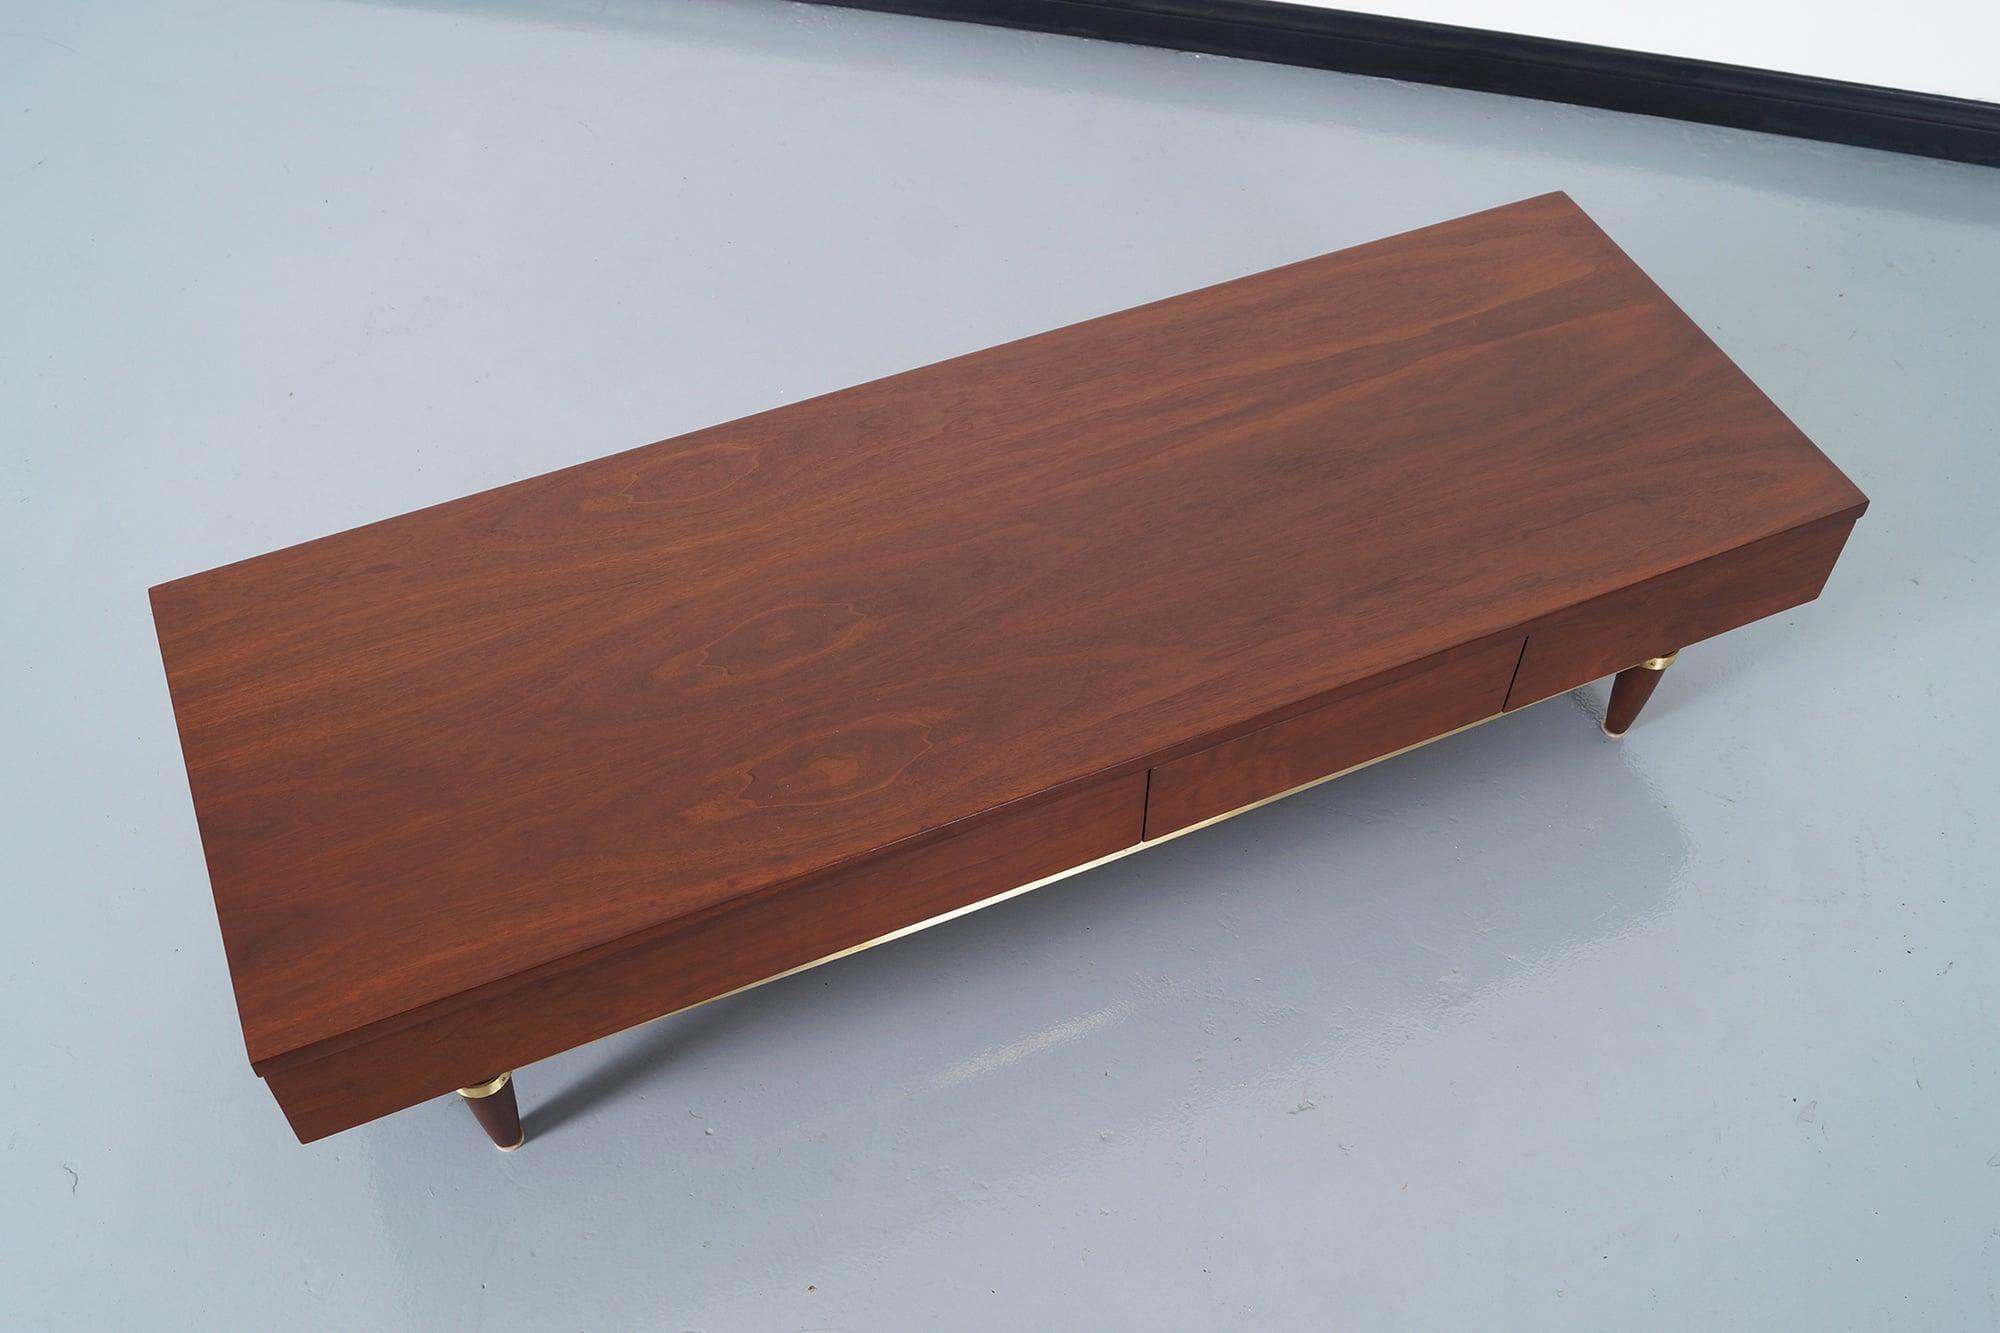 American of Martinsville Walnut Bench by Merton Gershun